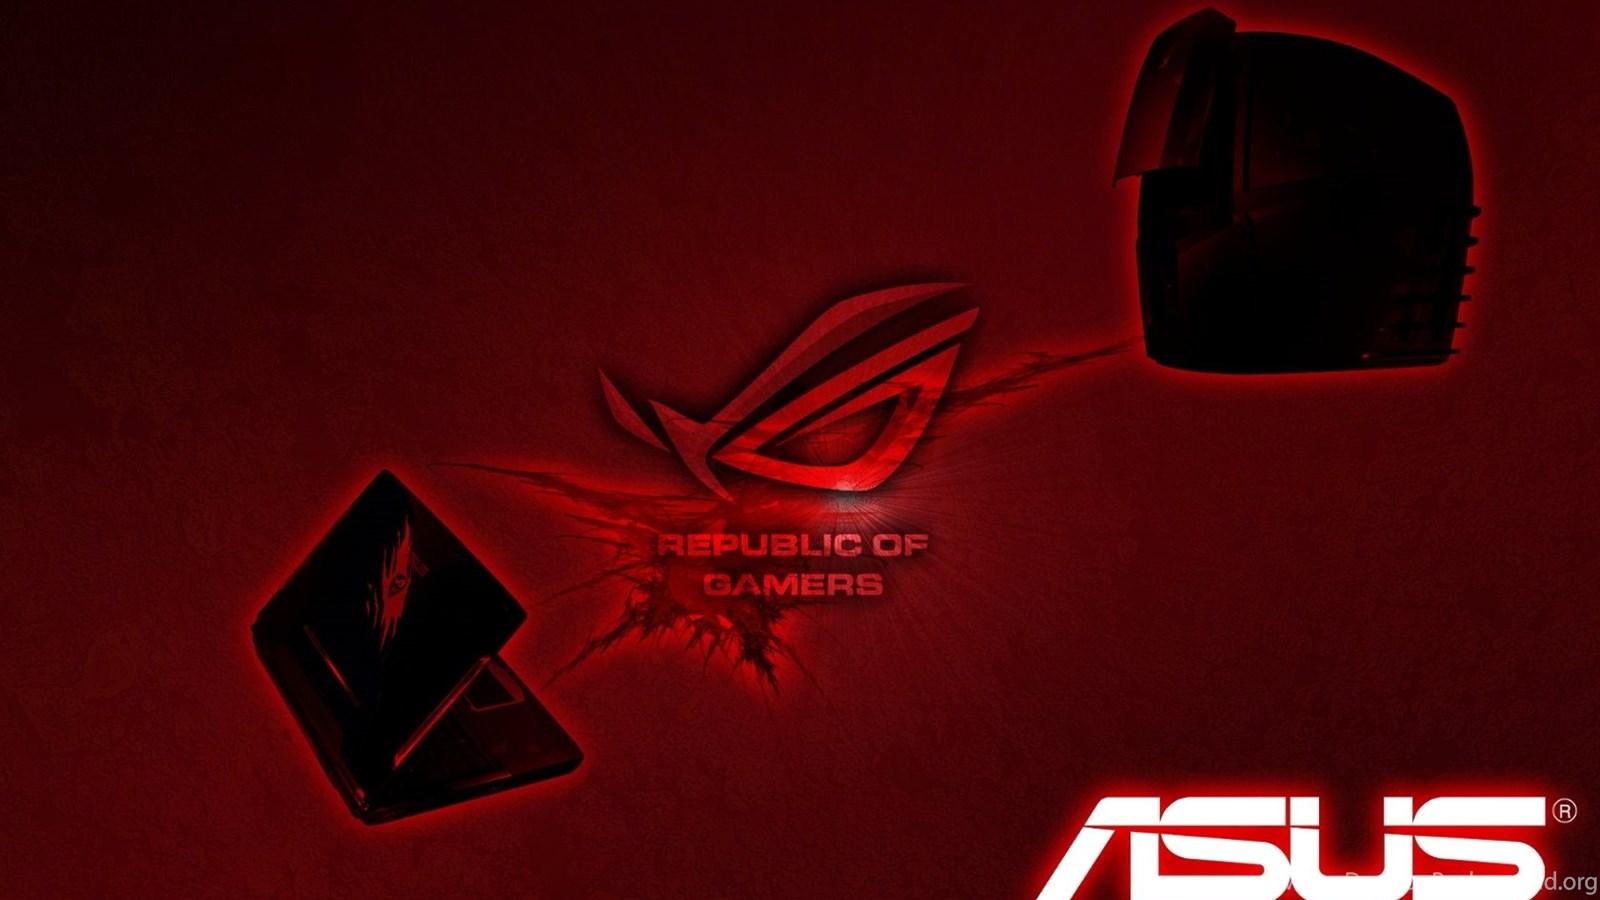 Asus Red ROG Logo HD Wallpapers Desktop Background